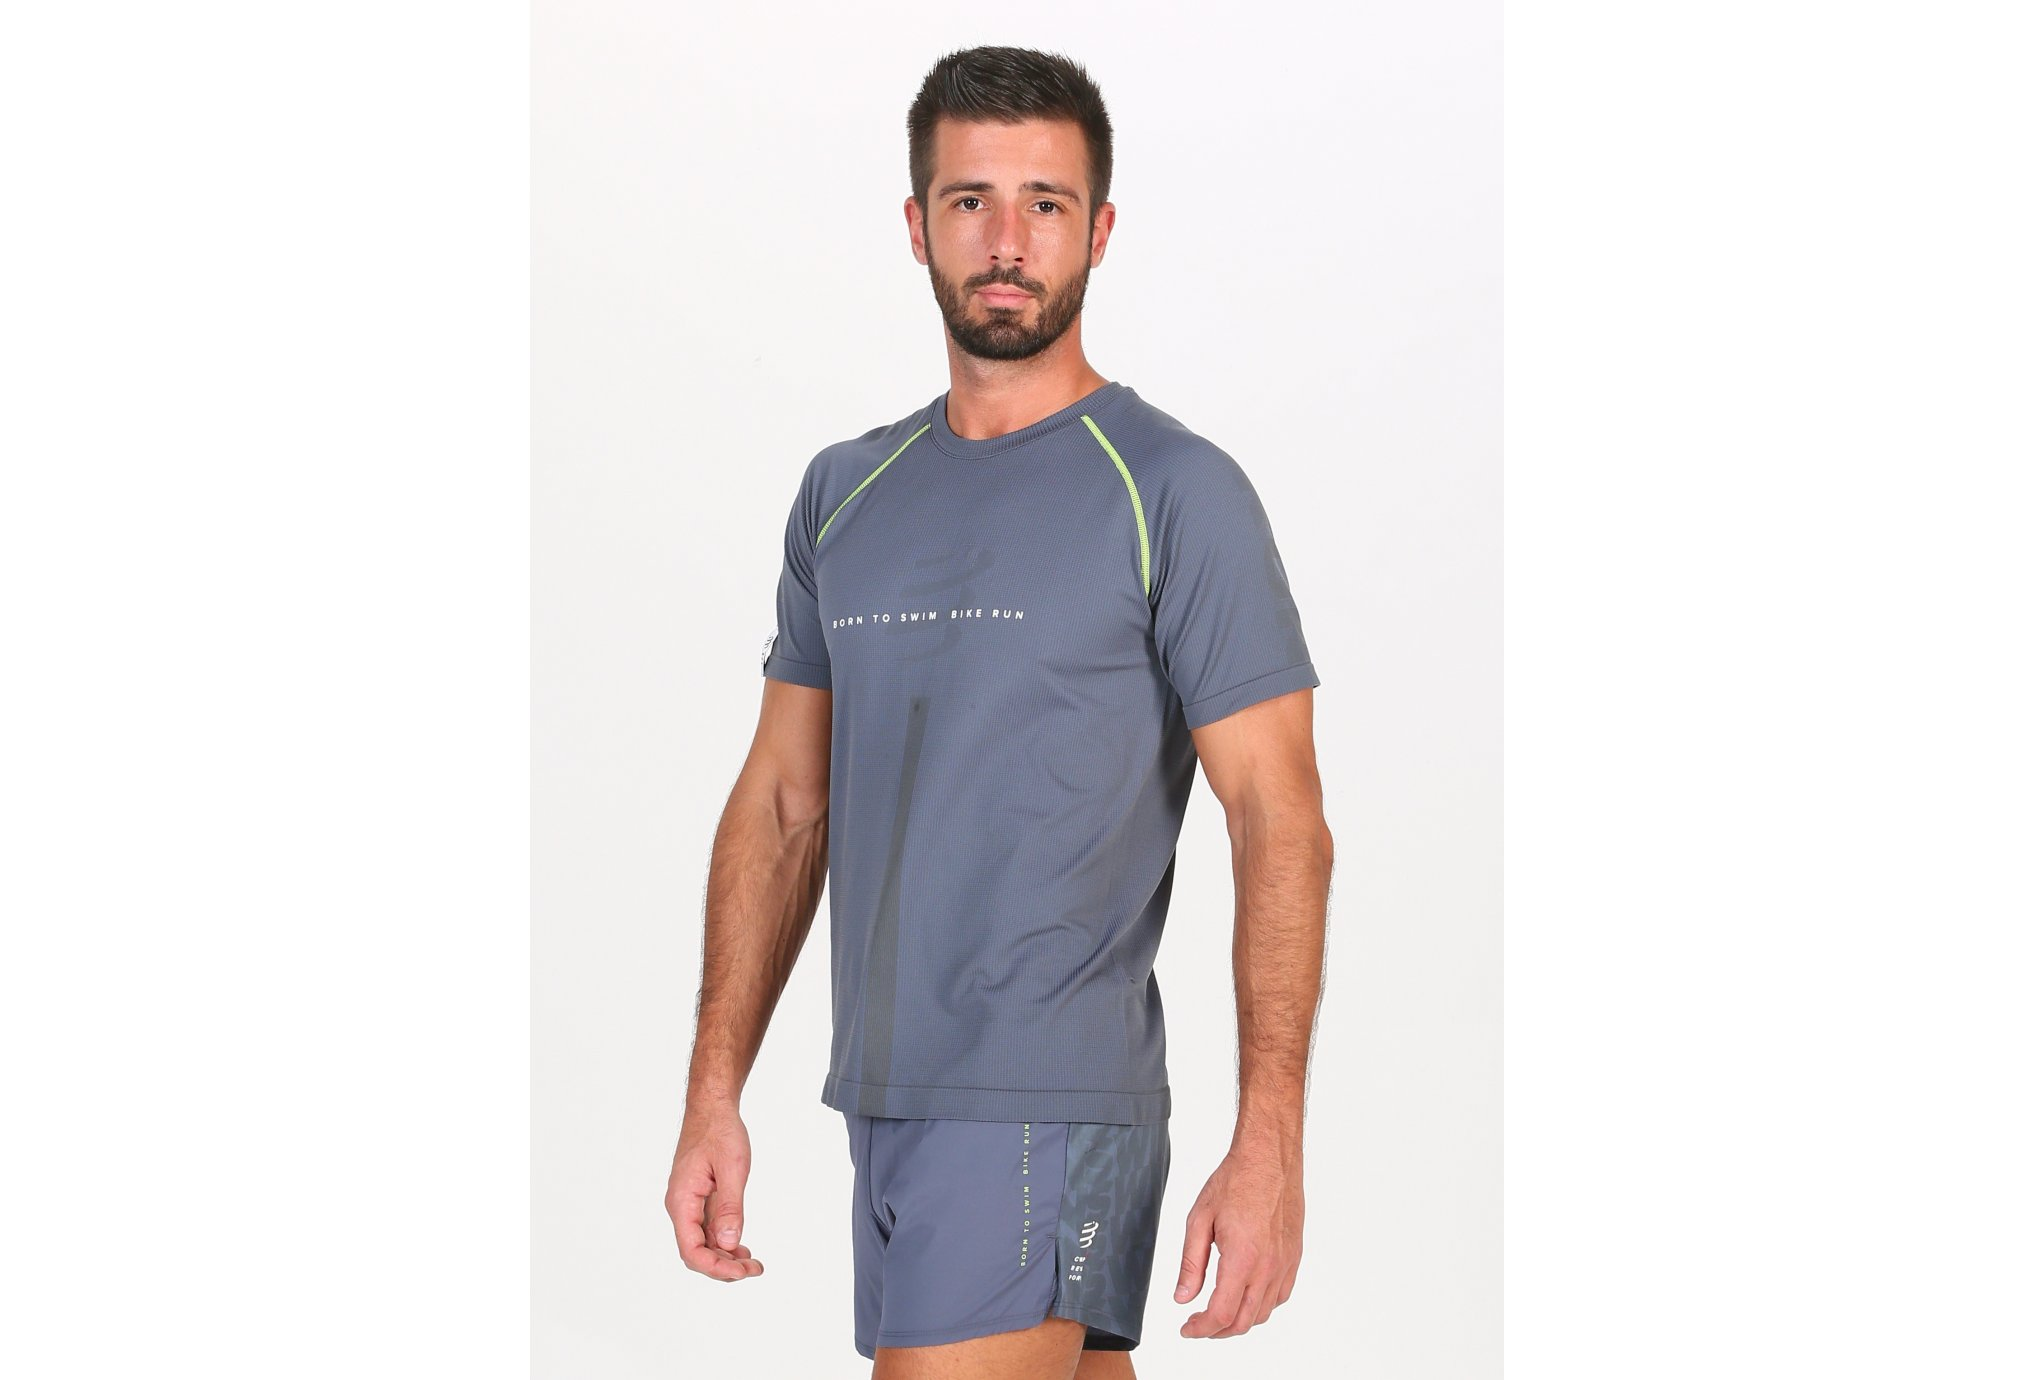 Compressport Training Born To SwimBikeRun 2020 M vêtement running homme